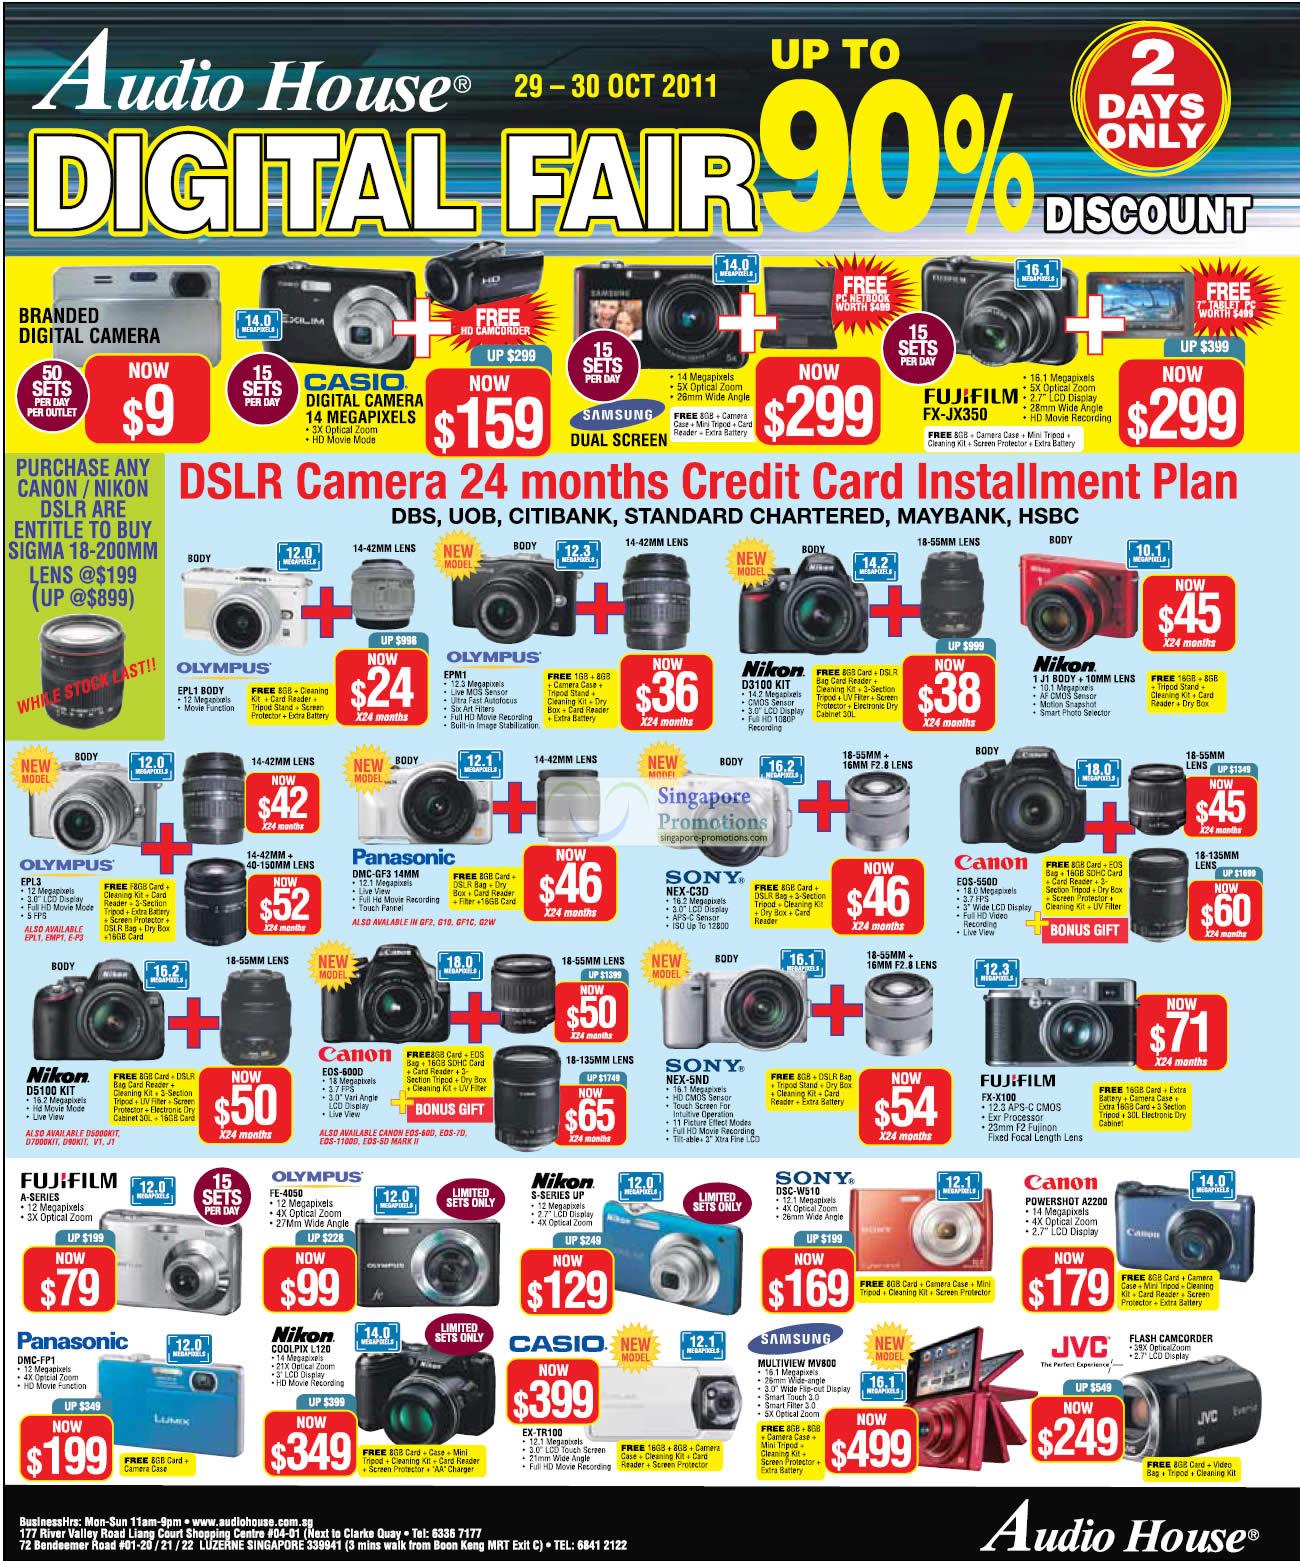 Sony Nex-5ND, Canon Powershow A2200, Panasonic DMC-FP1, Nikon Coolpix L120, Olympus FE-4050